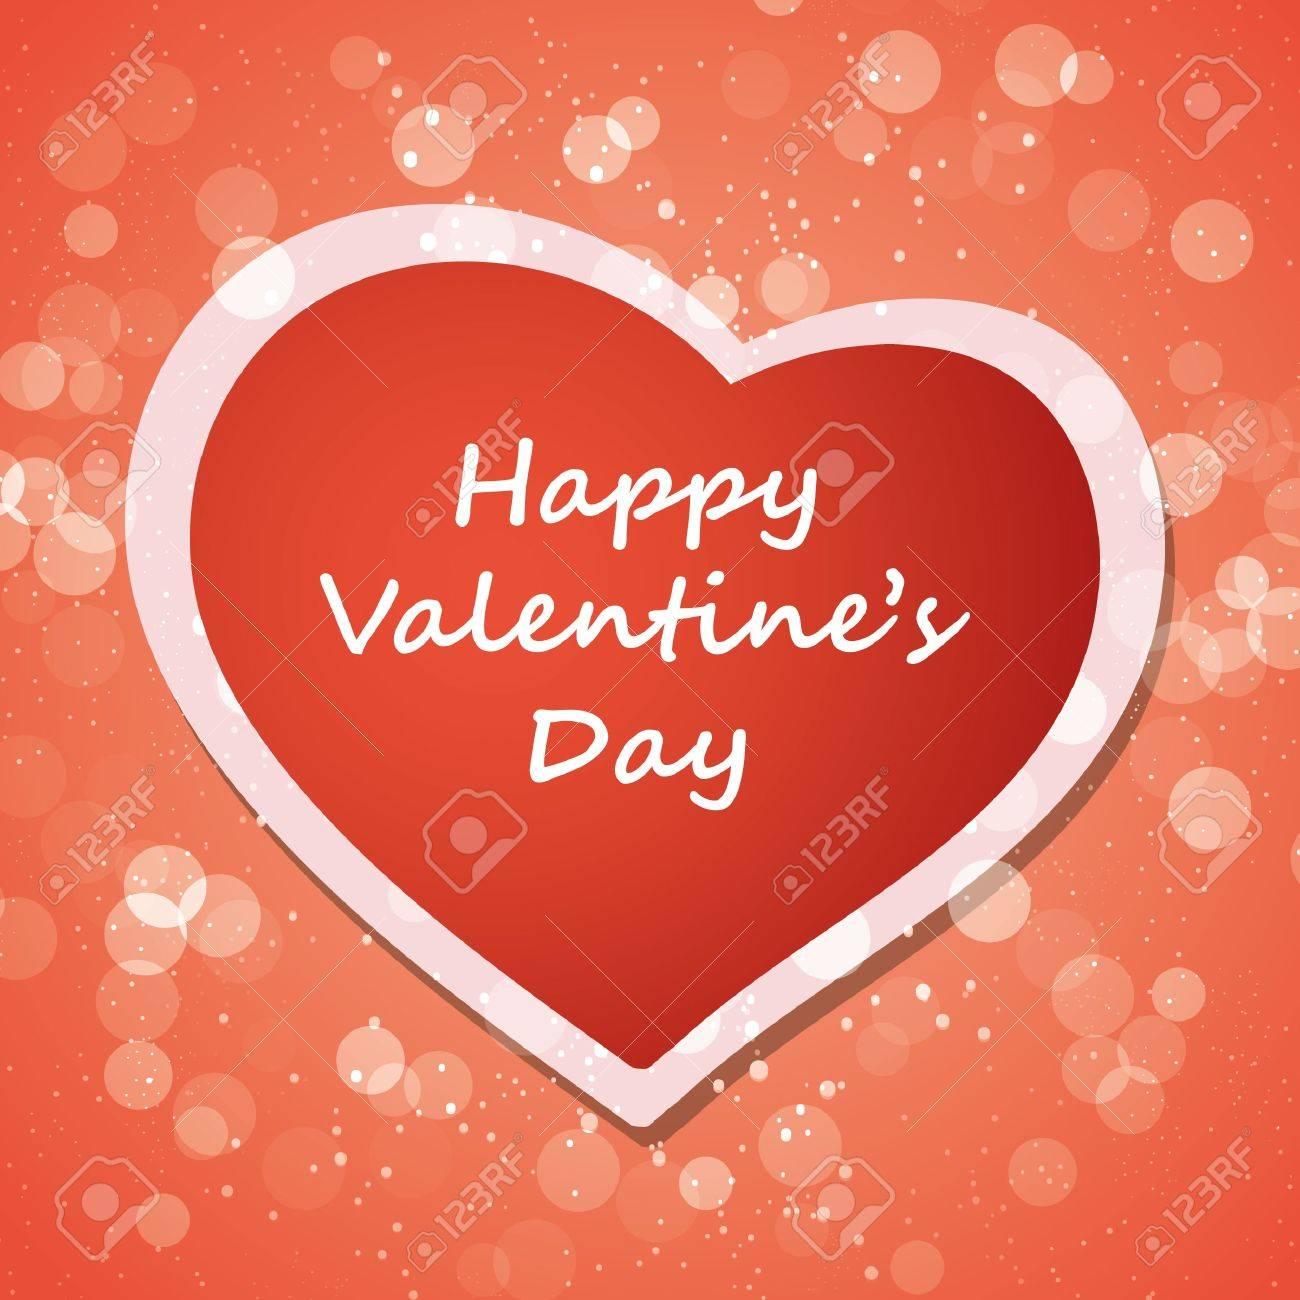 Hearts Background Vector Stock Vector - 11958377